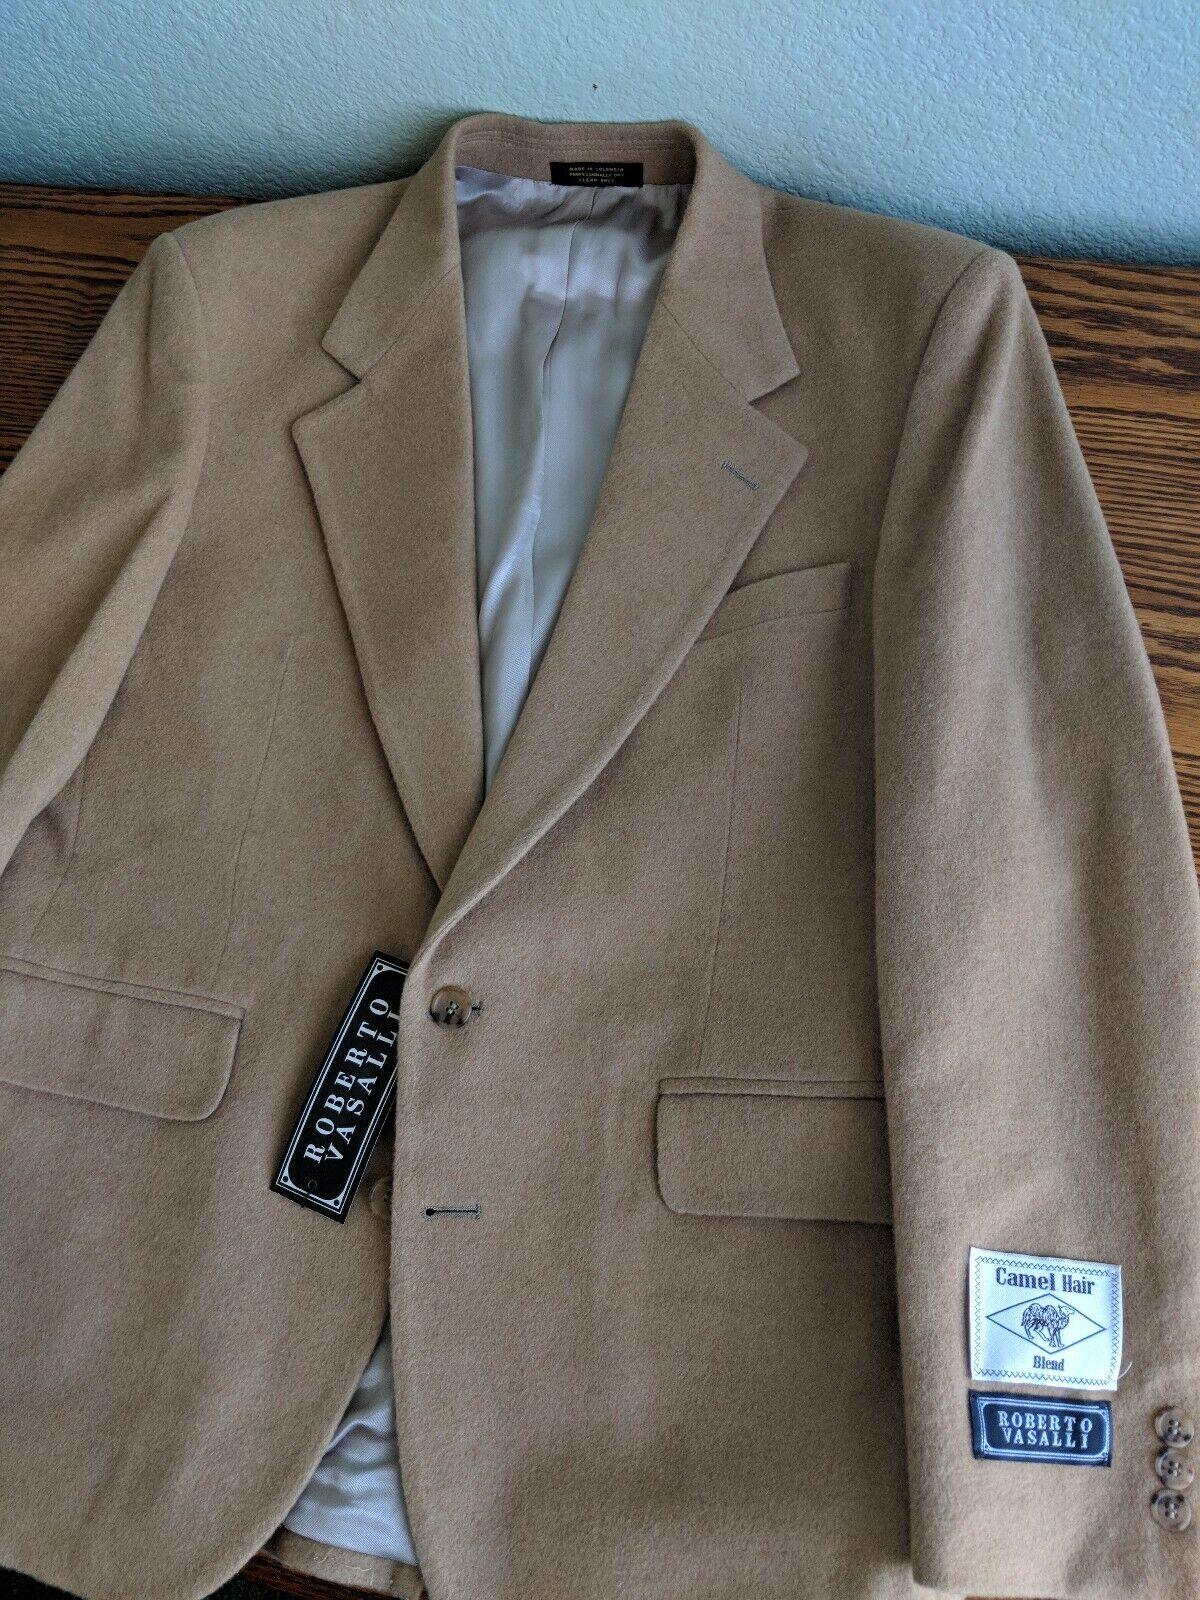 Roberto Vasalli Brown Sport Coat Mens Apparel Size 42R Camel Hair Blend blazer